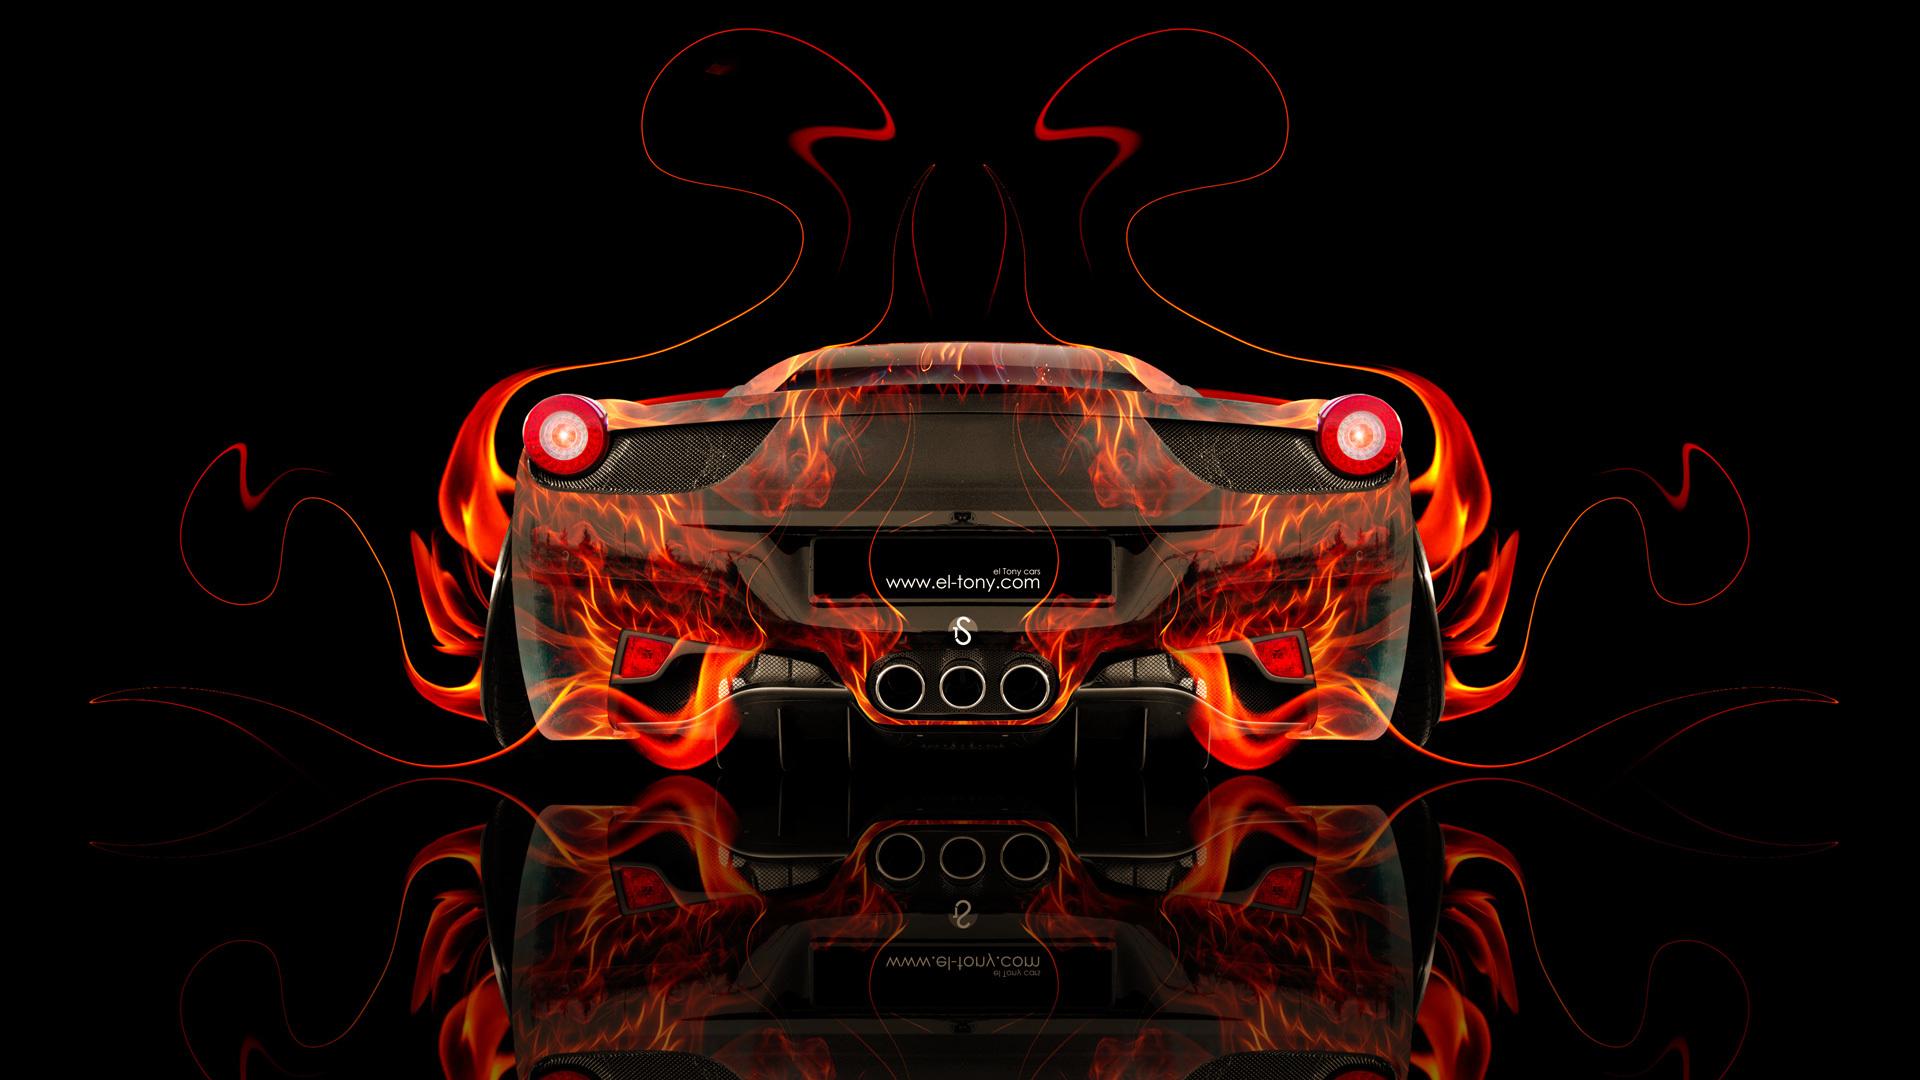 Wallpaper tony kokhan ferrari italia 458 back fire abstract car 1920x1080